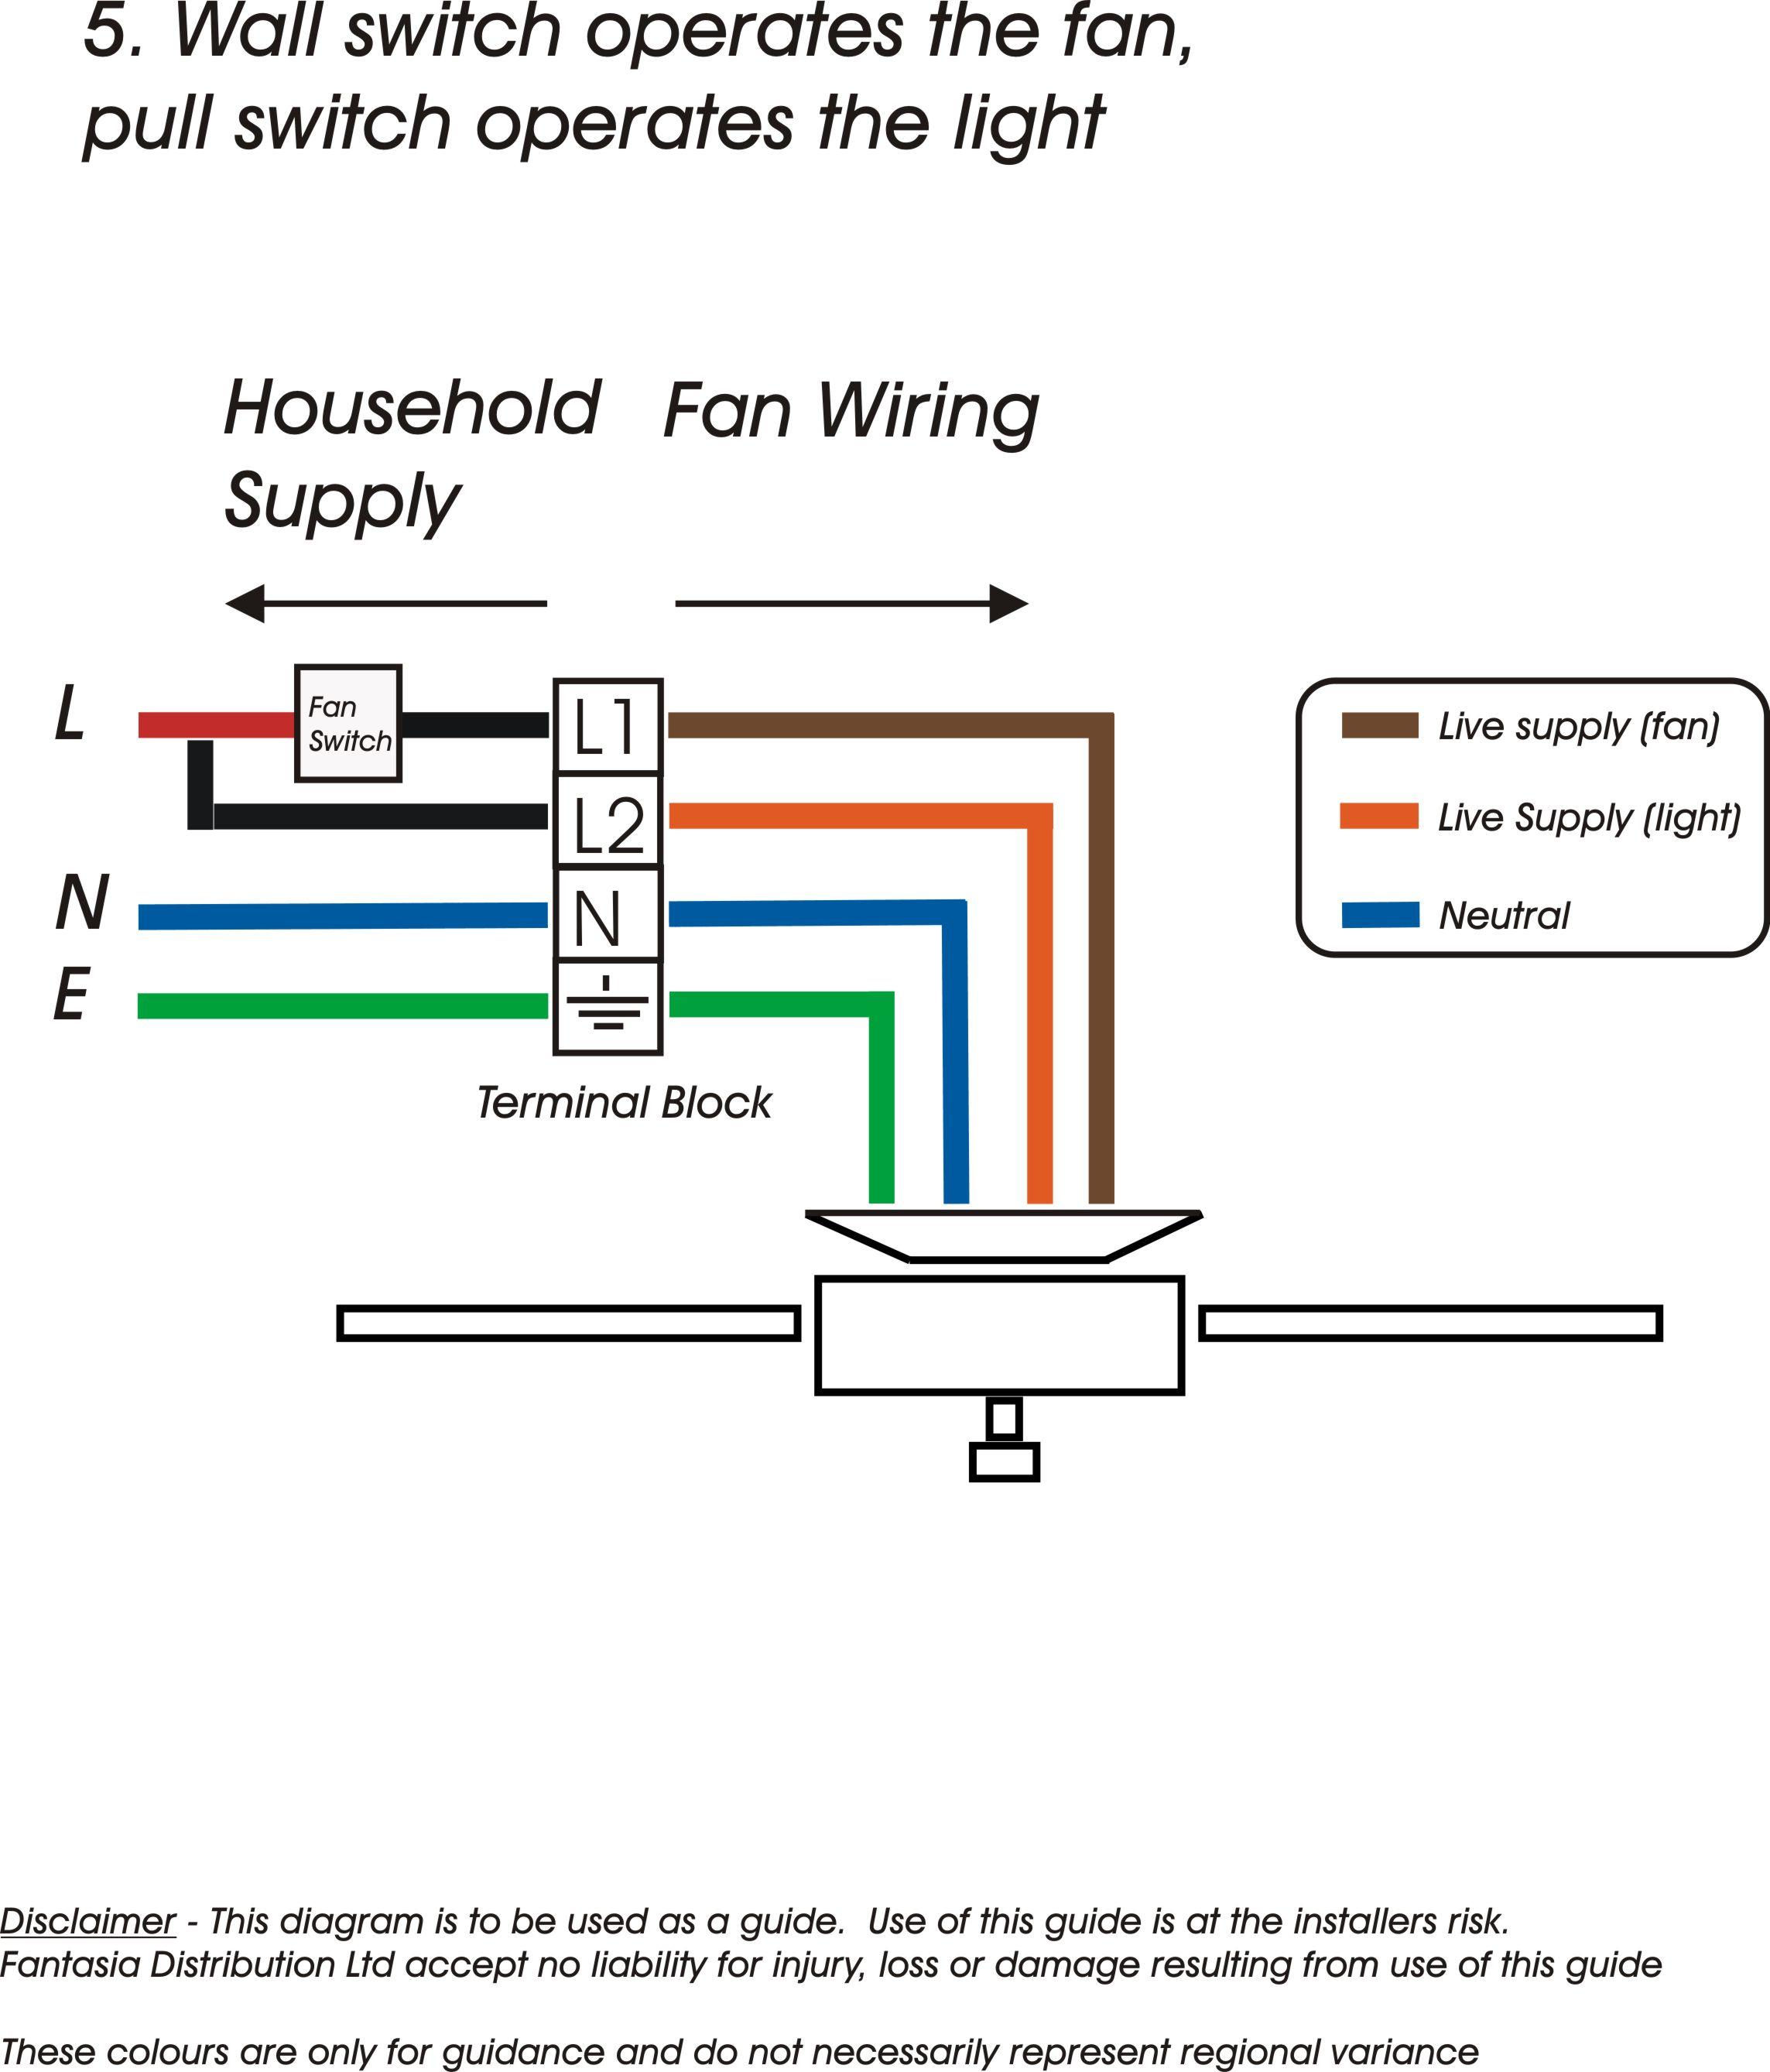 Electrical Wiring Diagram For Ceiling Fan | Manual E-Books - Fan Wiring Diagram